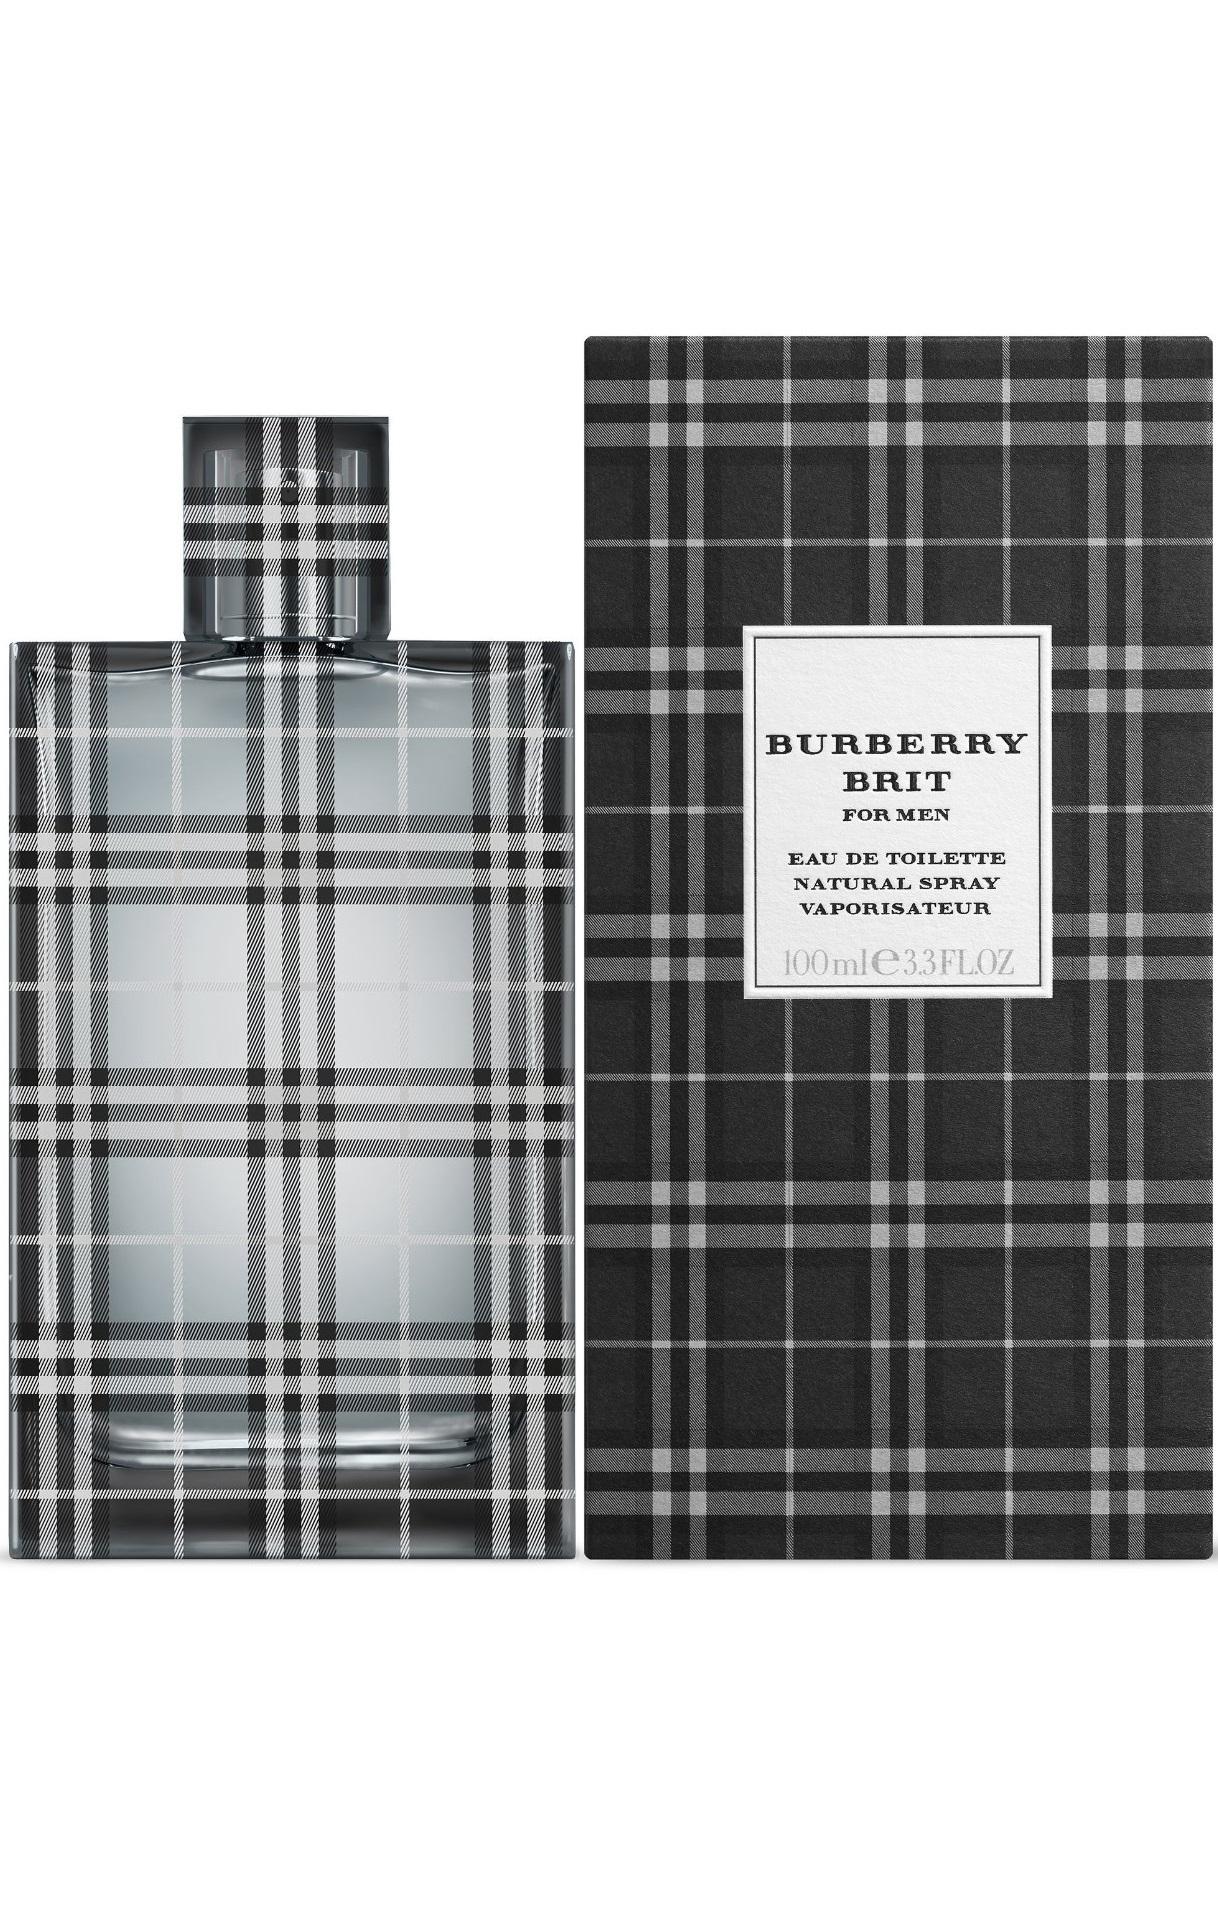 Burberry Brit EDT